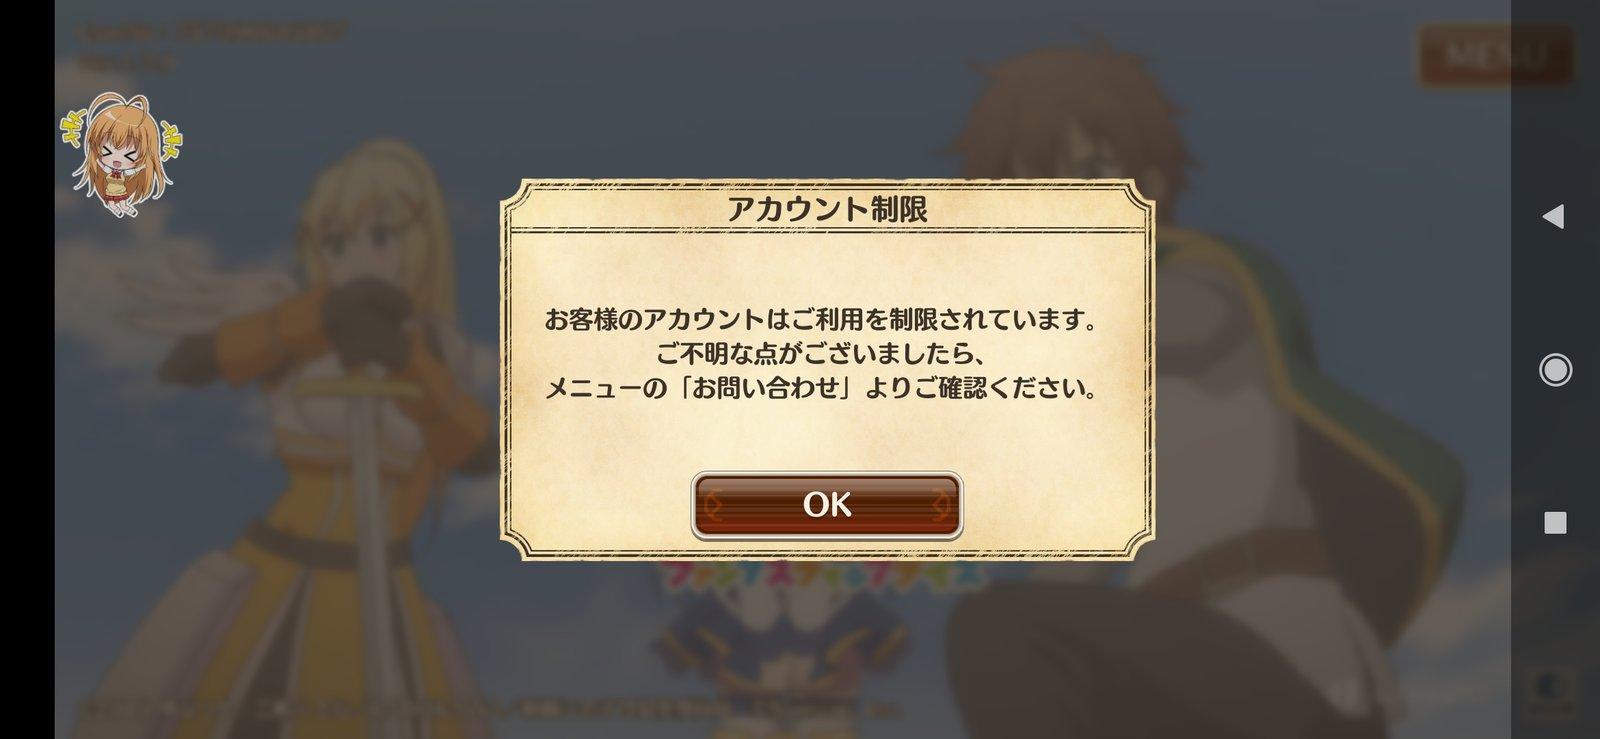 Screenshot_2020-09-15-05-11-10-565_jp.co.sumzap.pj0007.jpg